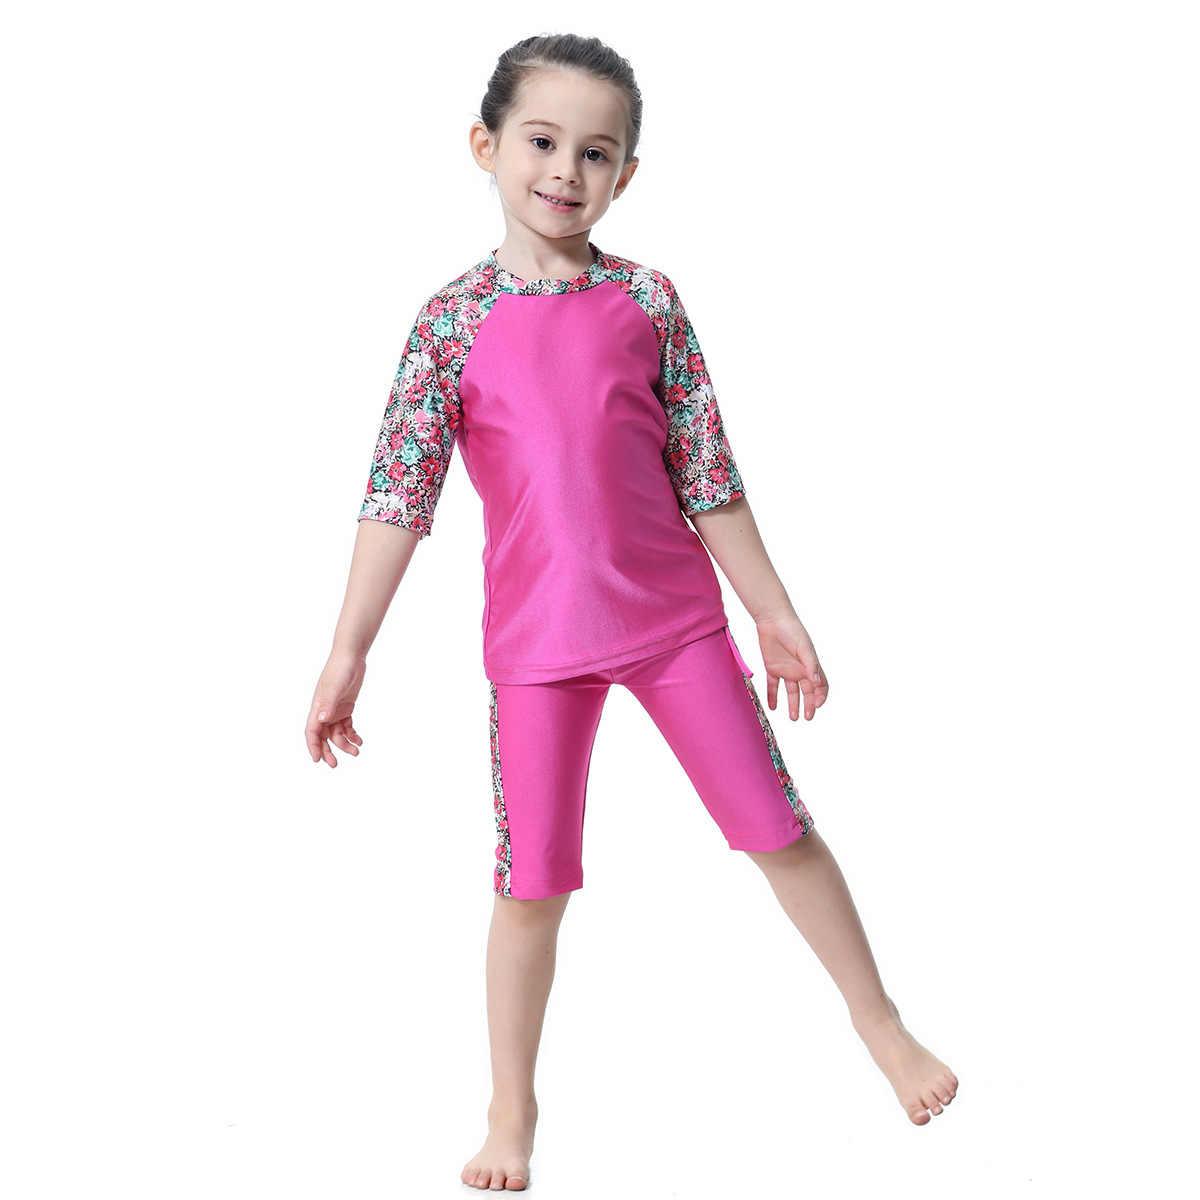 0cad88ad42b7b ... 2019 Muslim Girl Traditional Fashion Swimwear Islamic Swimsuit For Kids  Burkini Abaya Swimming Modest Clothing Short ...